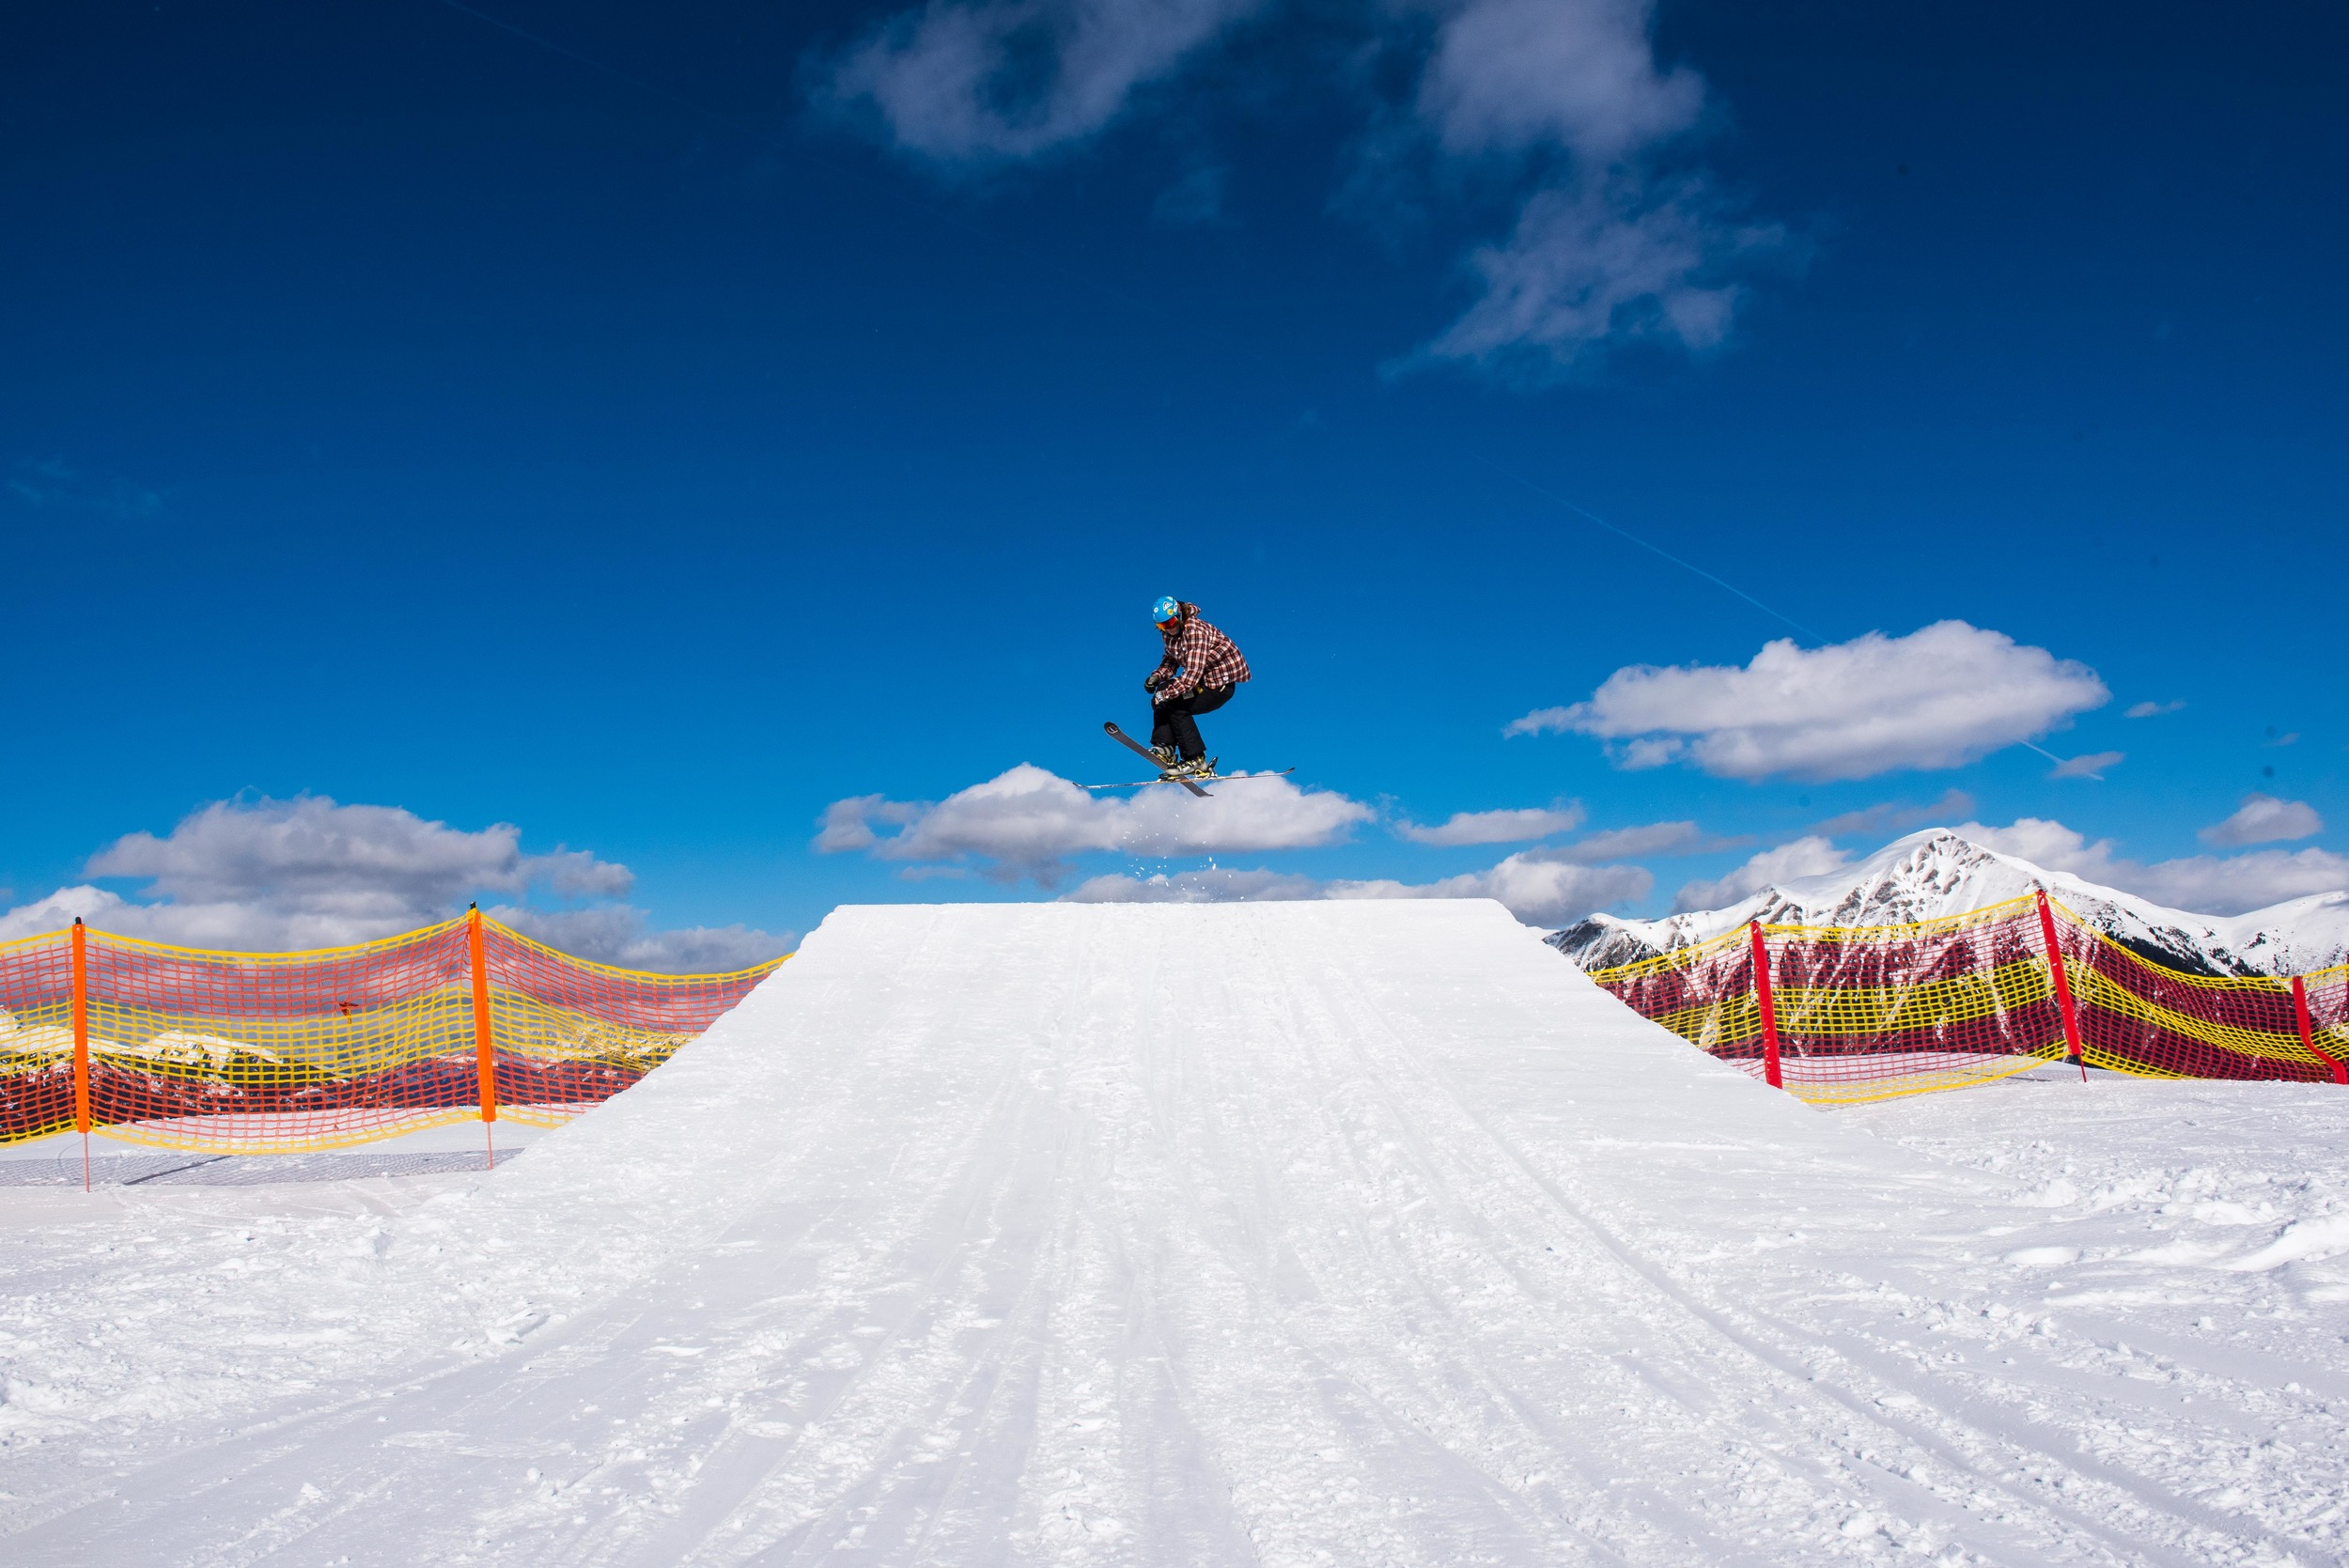 redbull-illume-submission-gustav-thuesen-photographer-fotograf-video-photo-foto-action-sports-adventure-travel-12.jpg